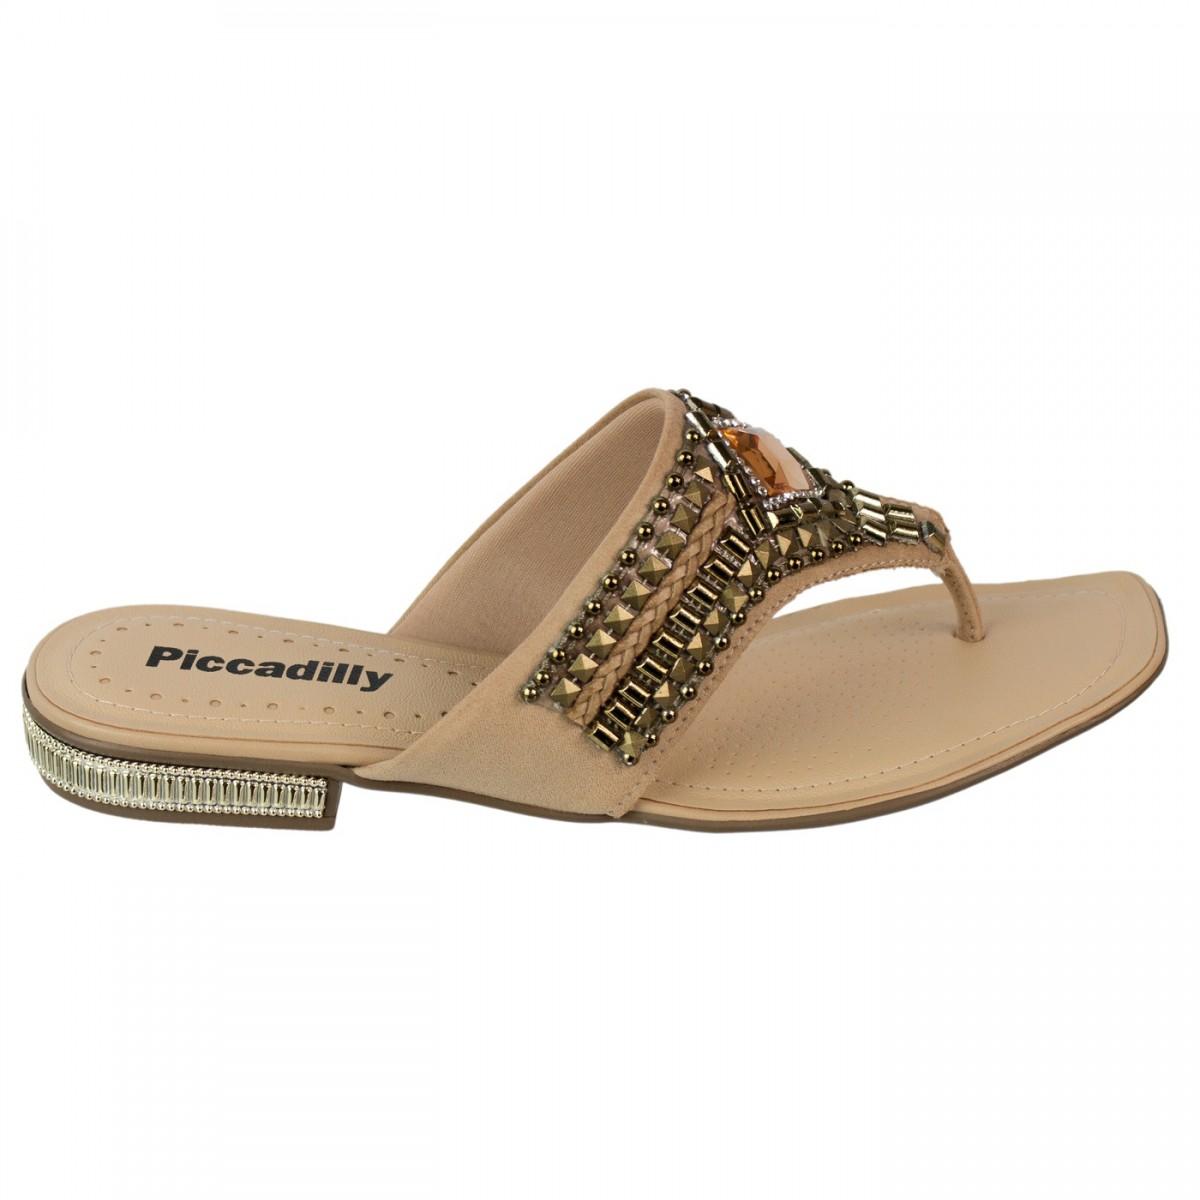 1068d4317d Bizz Store - Chinelo Rasteira Feminino Piccadilly Bege C  Pedras